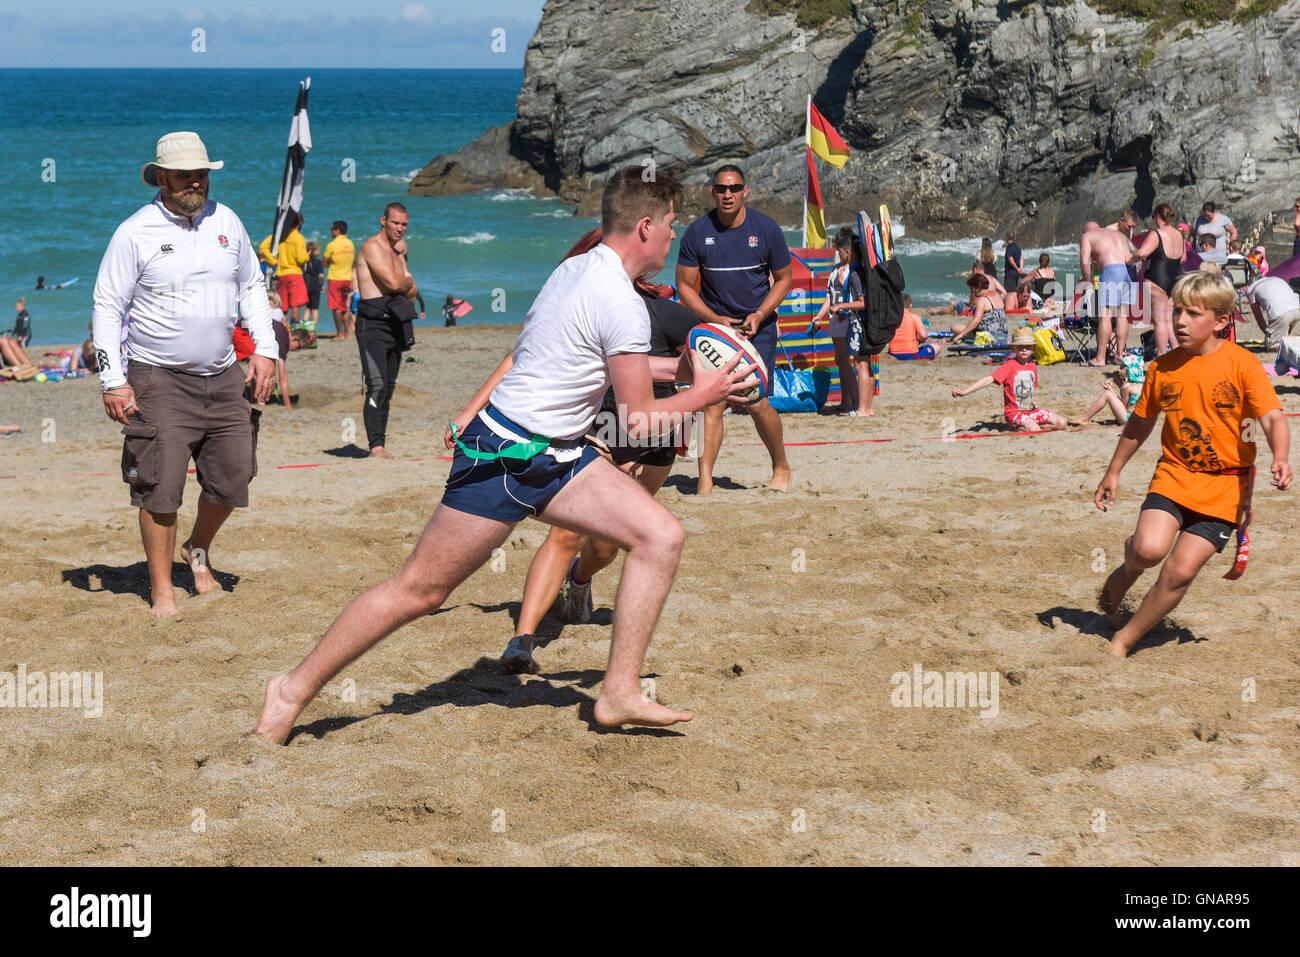 Die jährliche Lusty Glasur Strand Tag Rugby-Turnier in Newquay, Cornwall. Stockbild